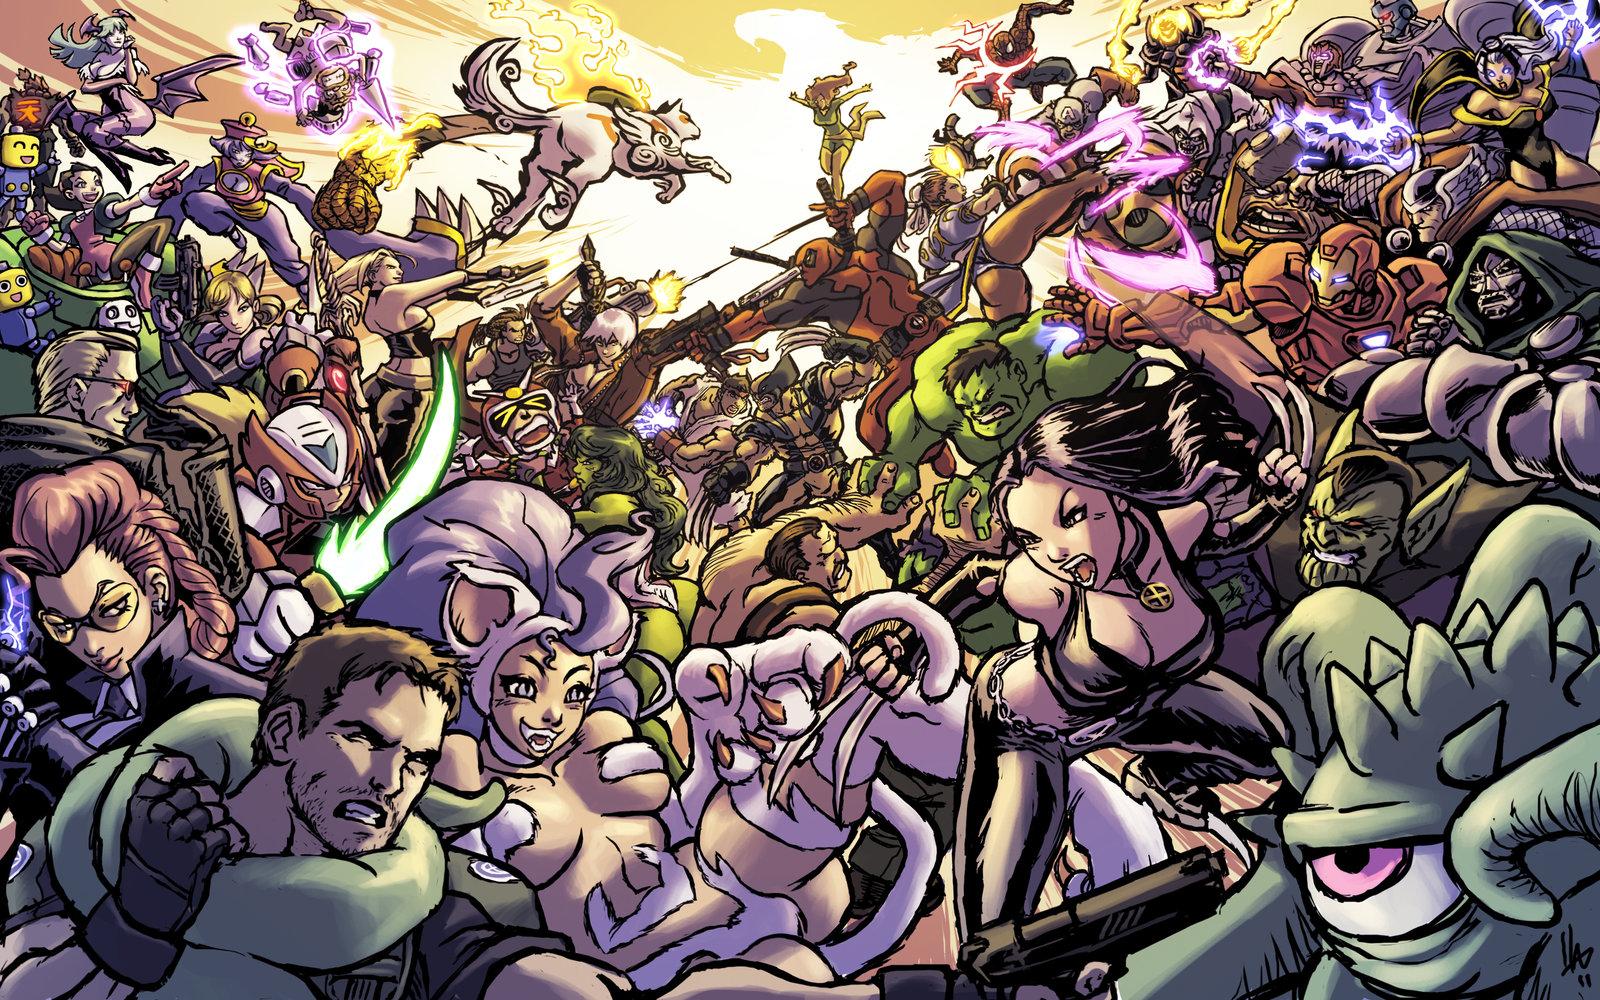 Marvel Vs Capcom 3 Wallpaper - WallpaperSafari